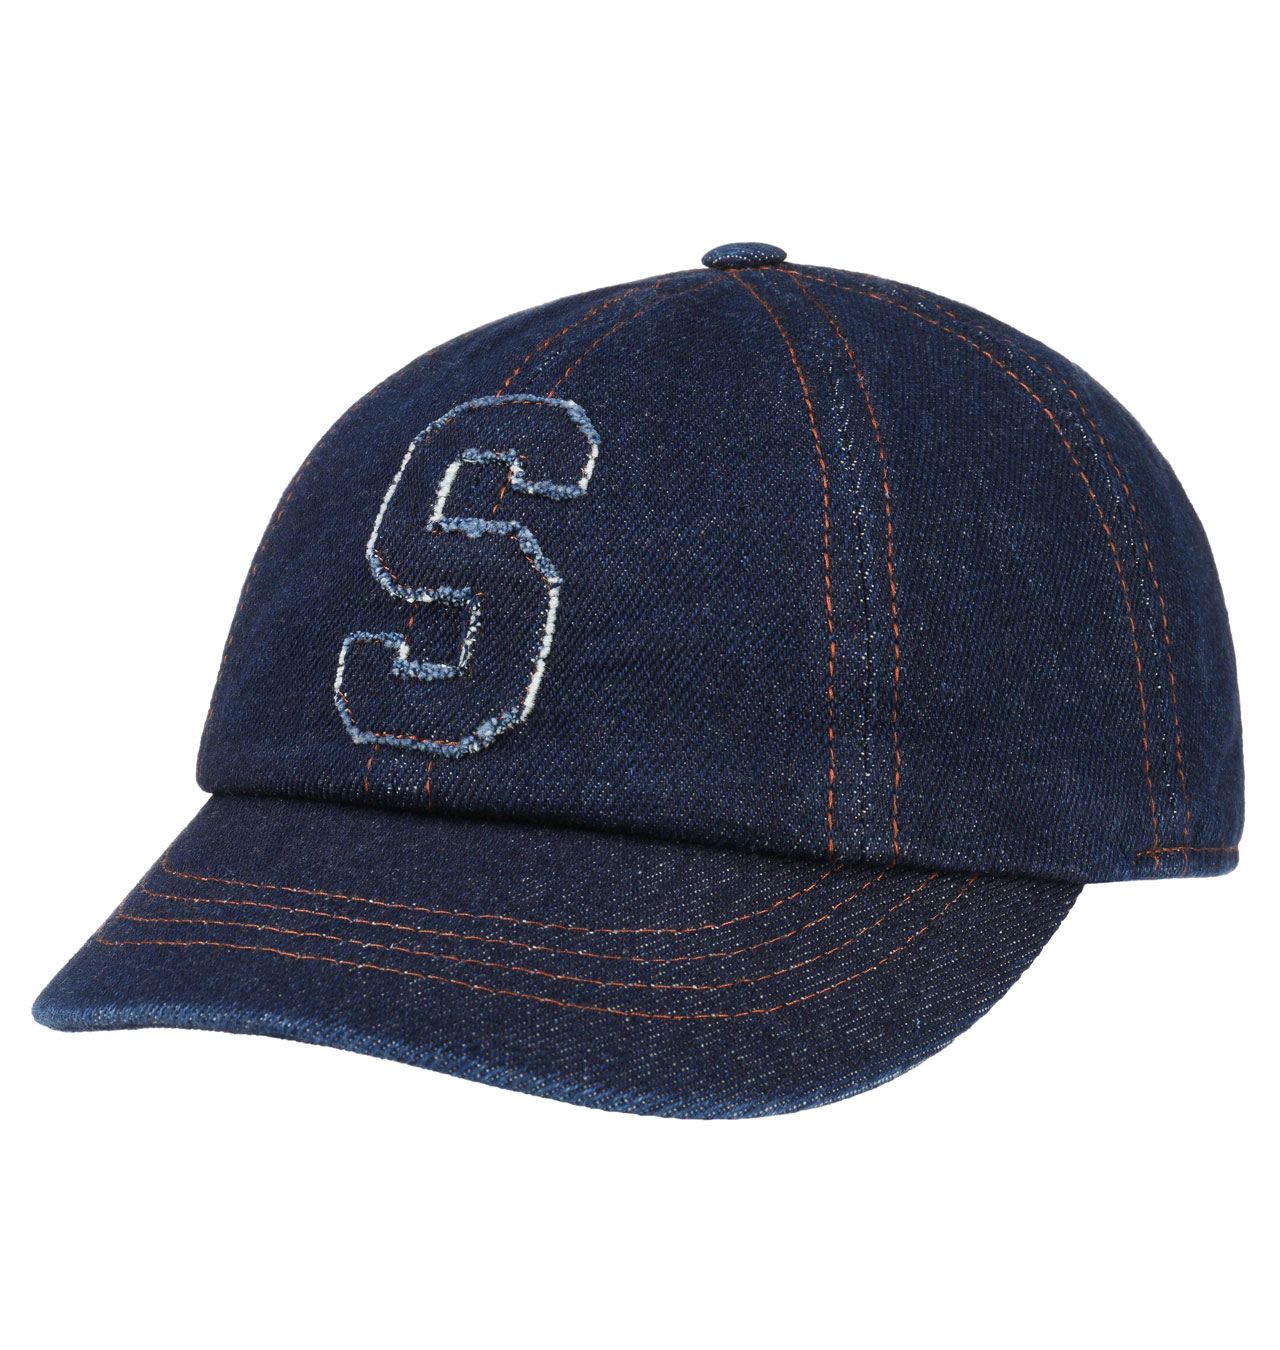 Ives Jean Unisex Baseball Cap Adjustable Outdoor Sports Classic Hats Nostromo Denim Baseball-Cap Twill Adjustable Hat